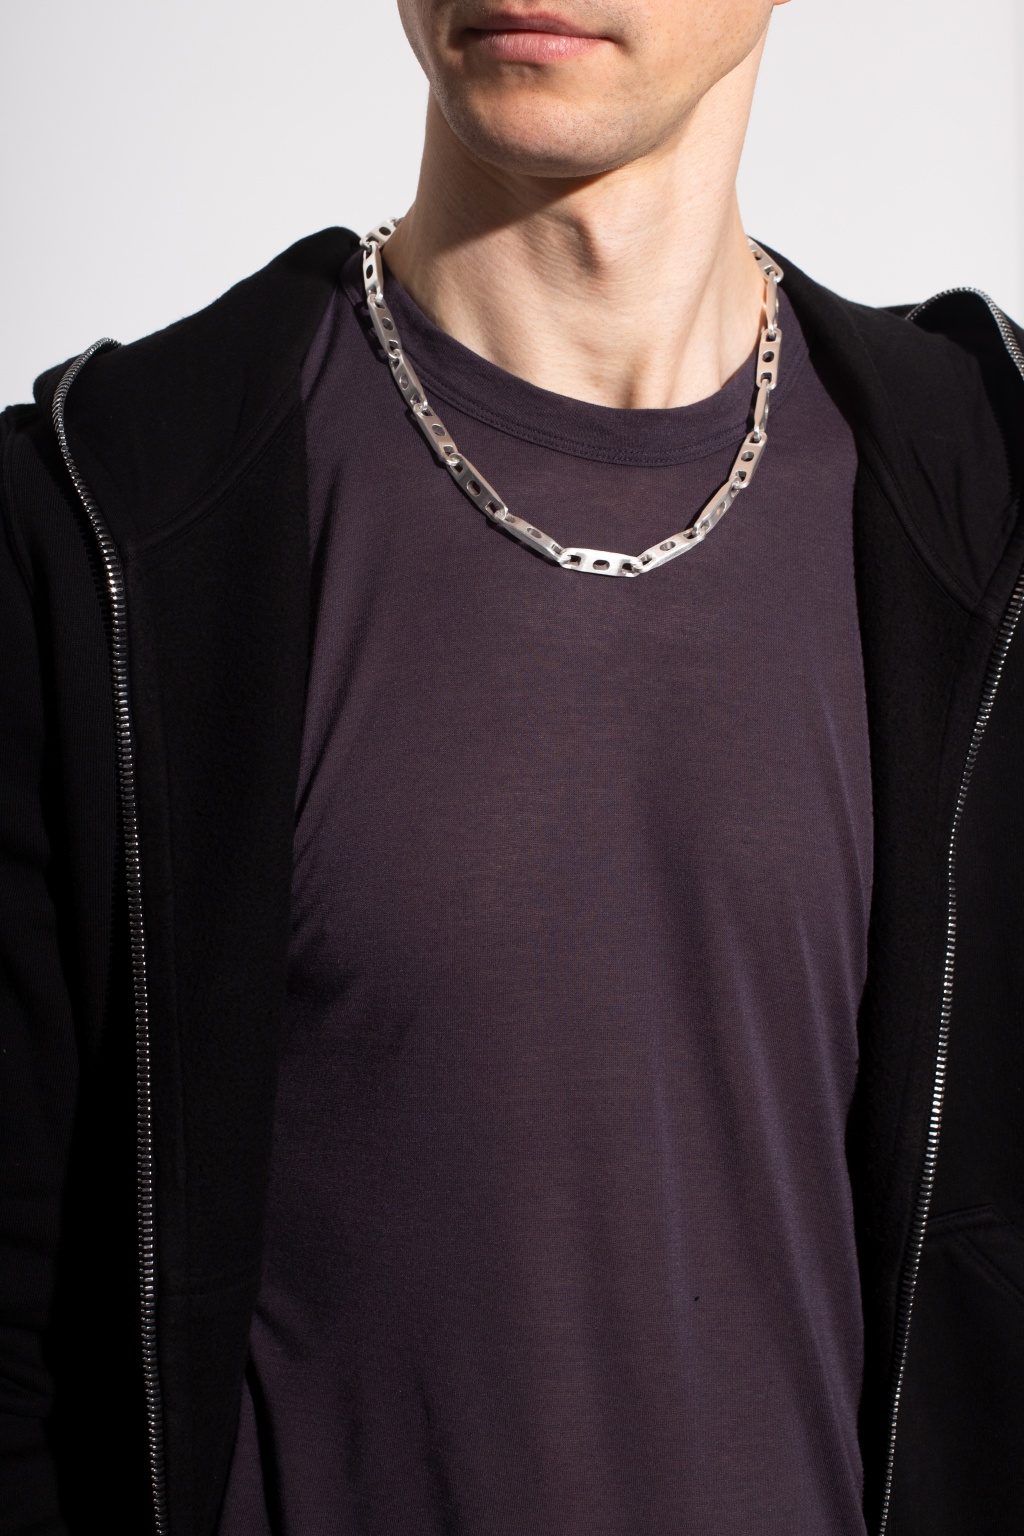 Rick Owens Silver necklace